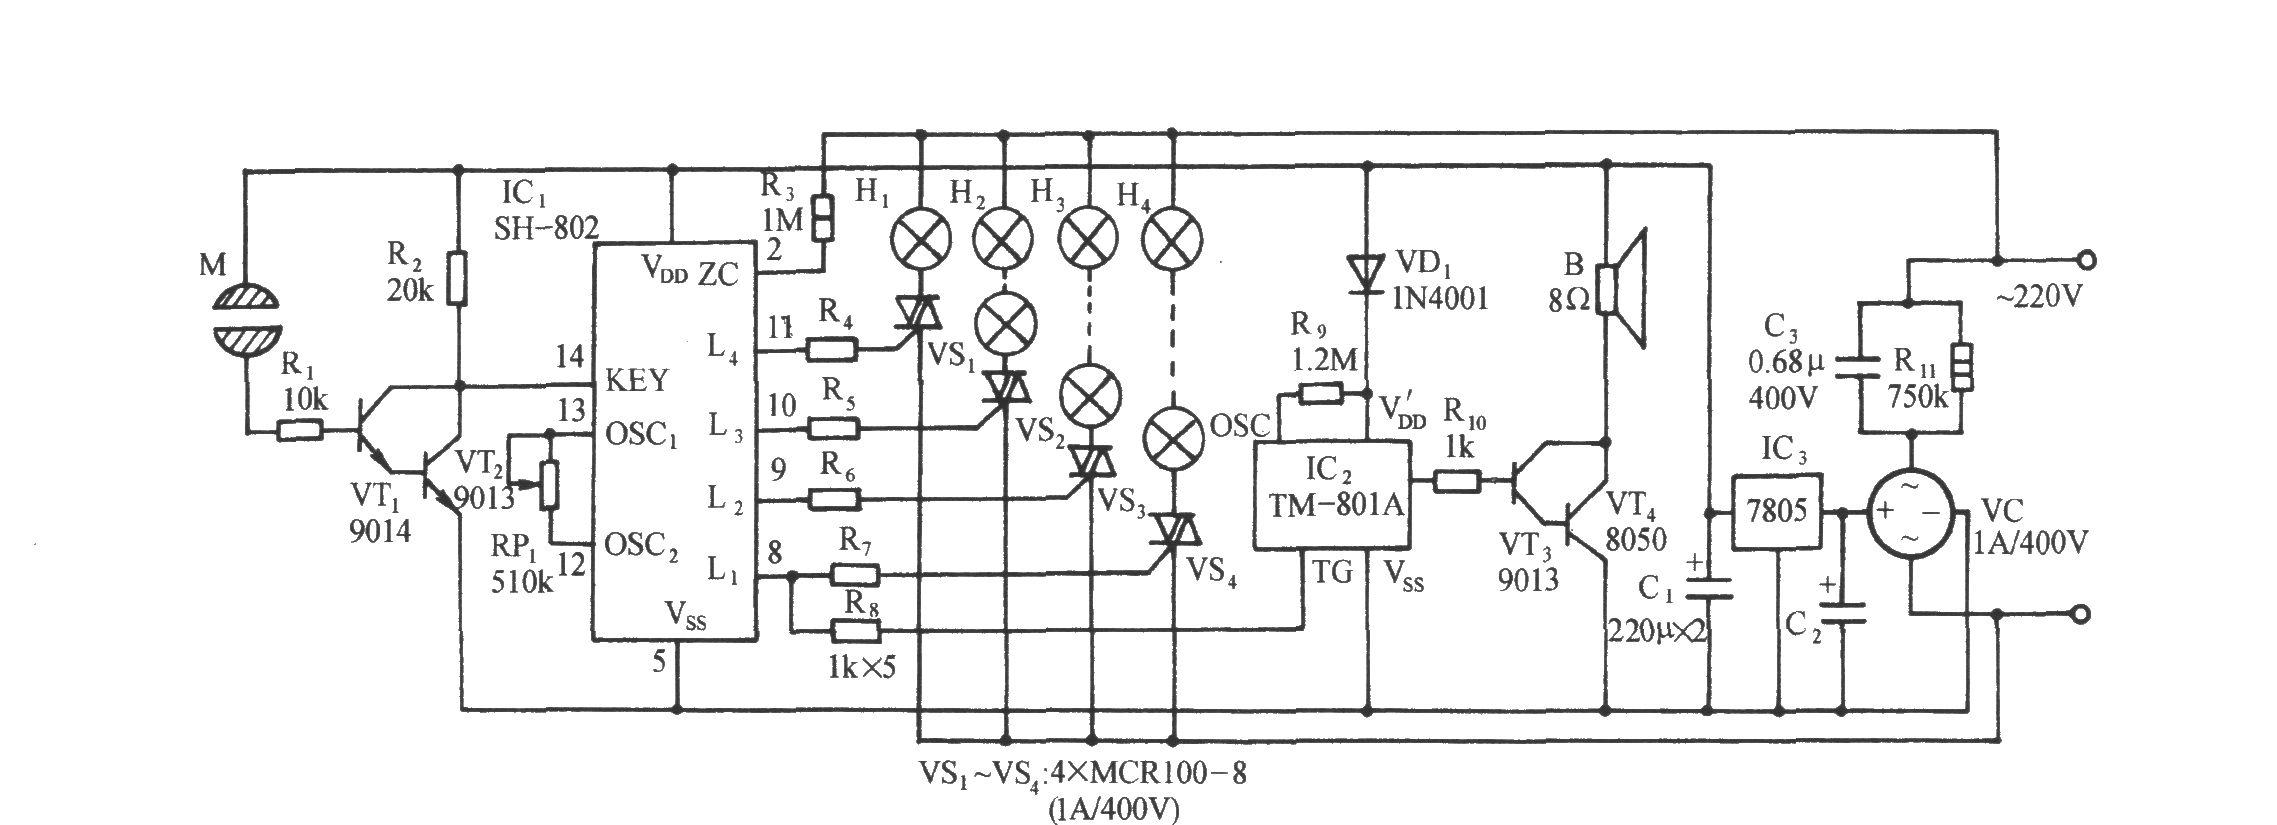 sh-802多种闪光花样彩灯伴吉庆鼓声控制电路